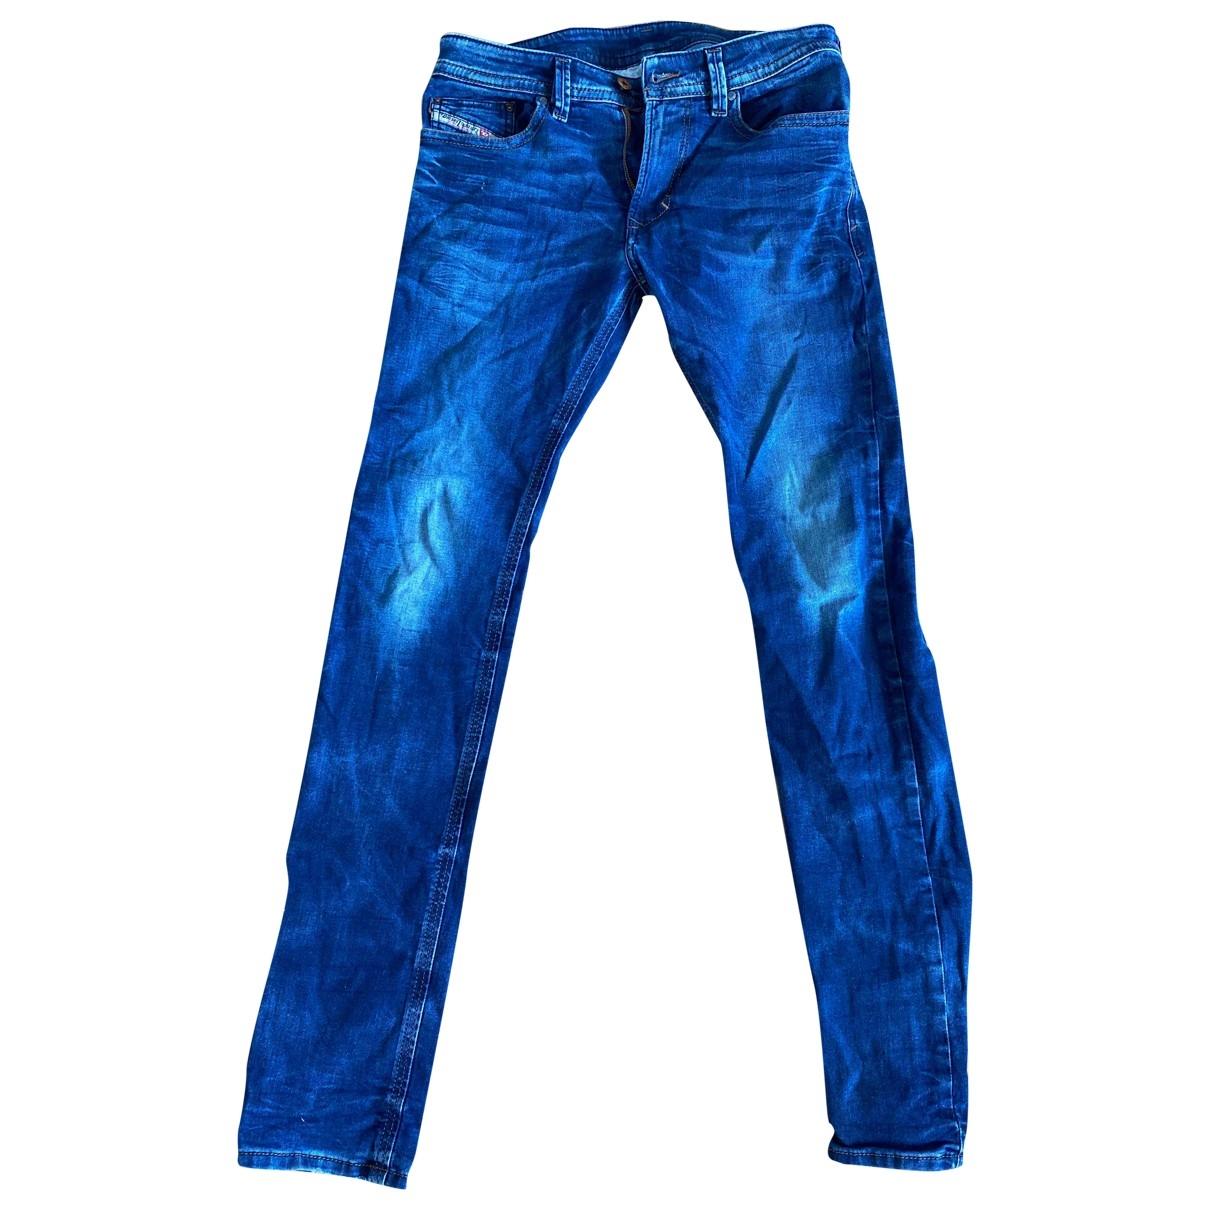 Diesel \N Blue Cotton - elasthane Jeans for Men 29 US